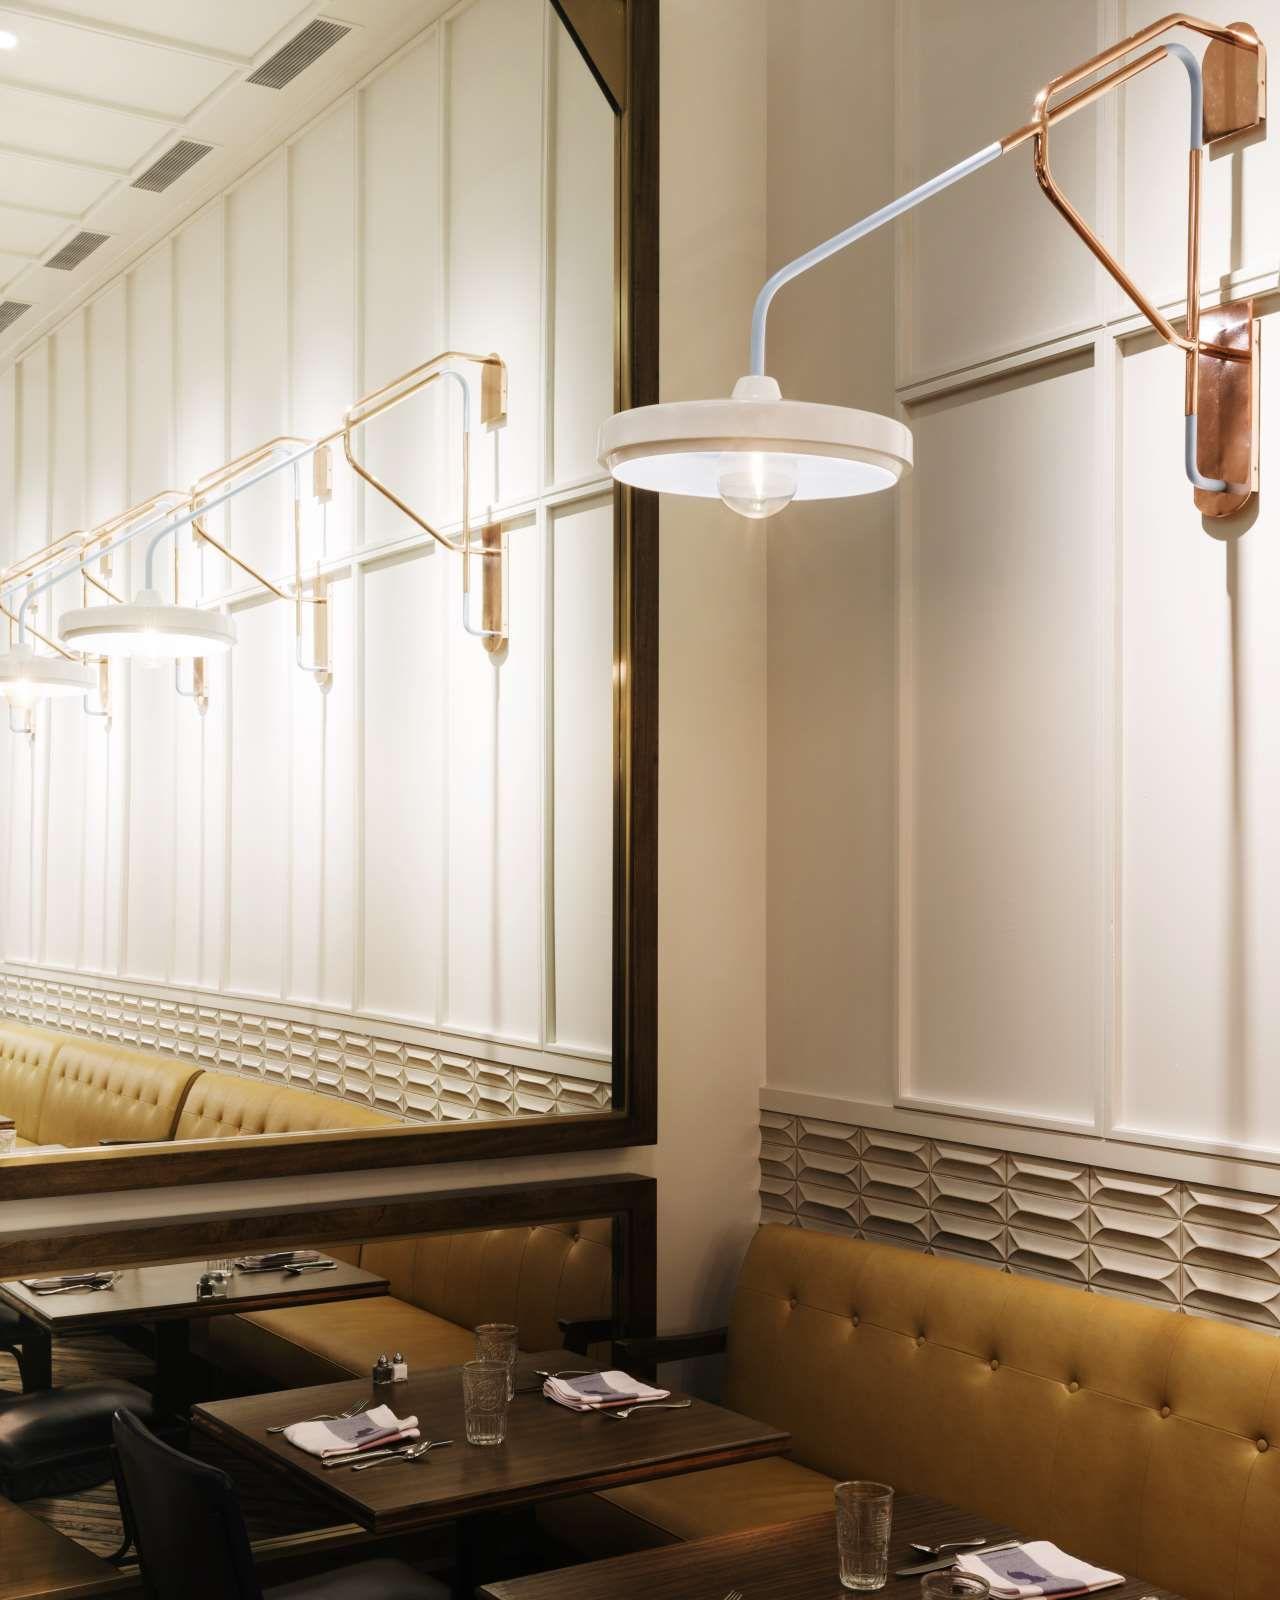 Marcus Restaurant Serves A Homey Atmosphere In Cosmopolitan